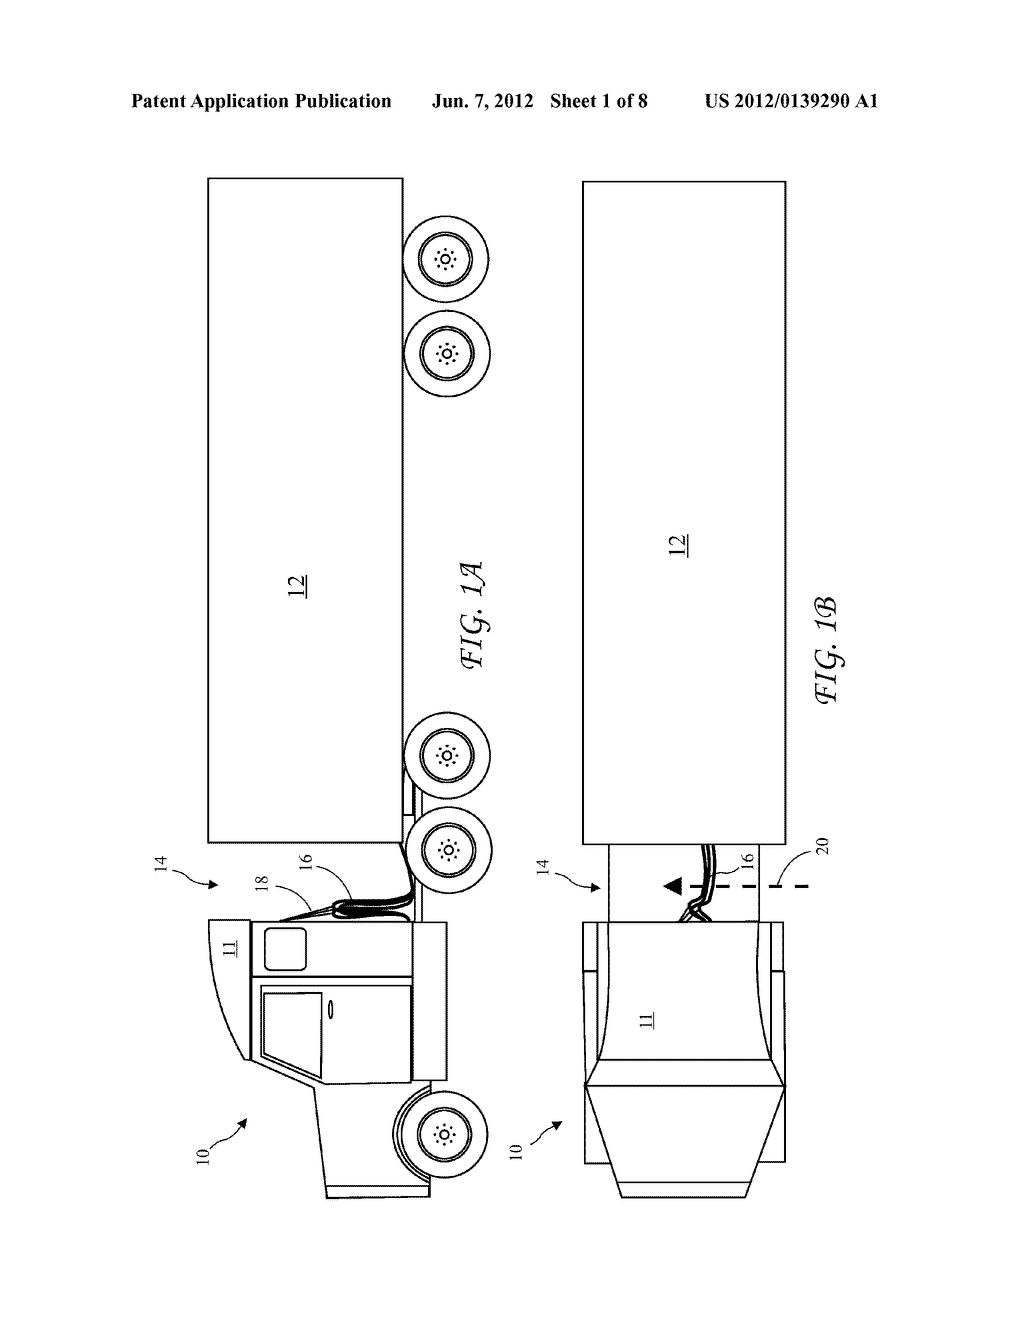 wiring meter form diagrams get free image about wiring diagram